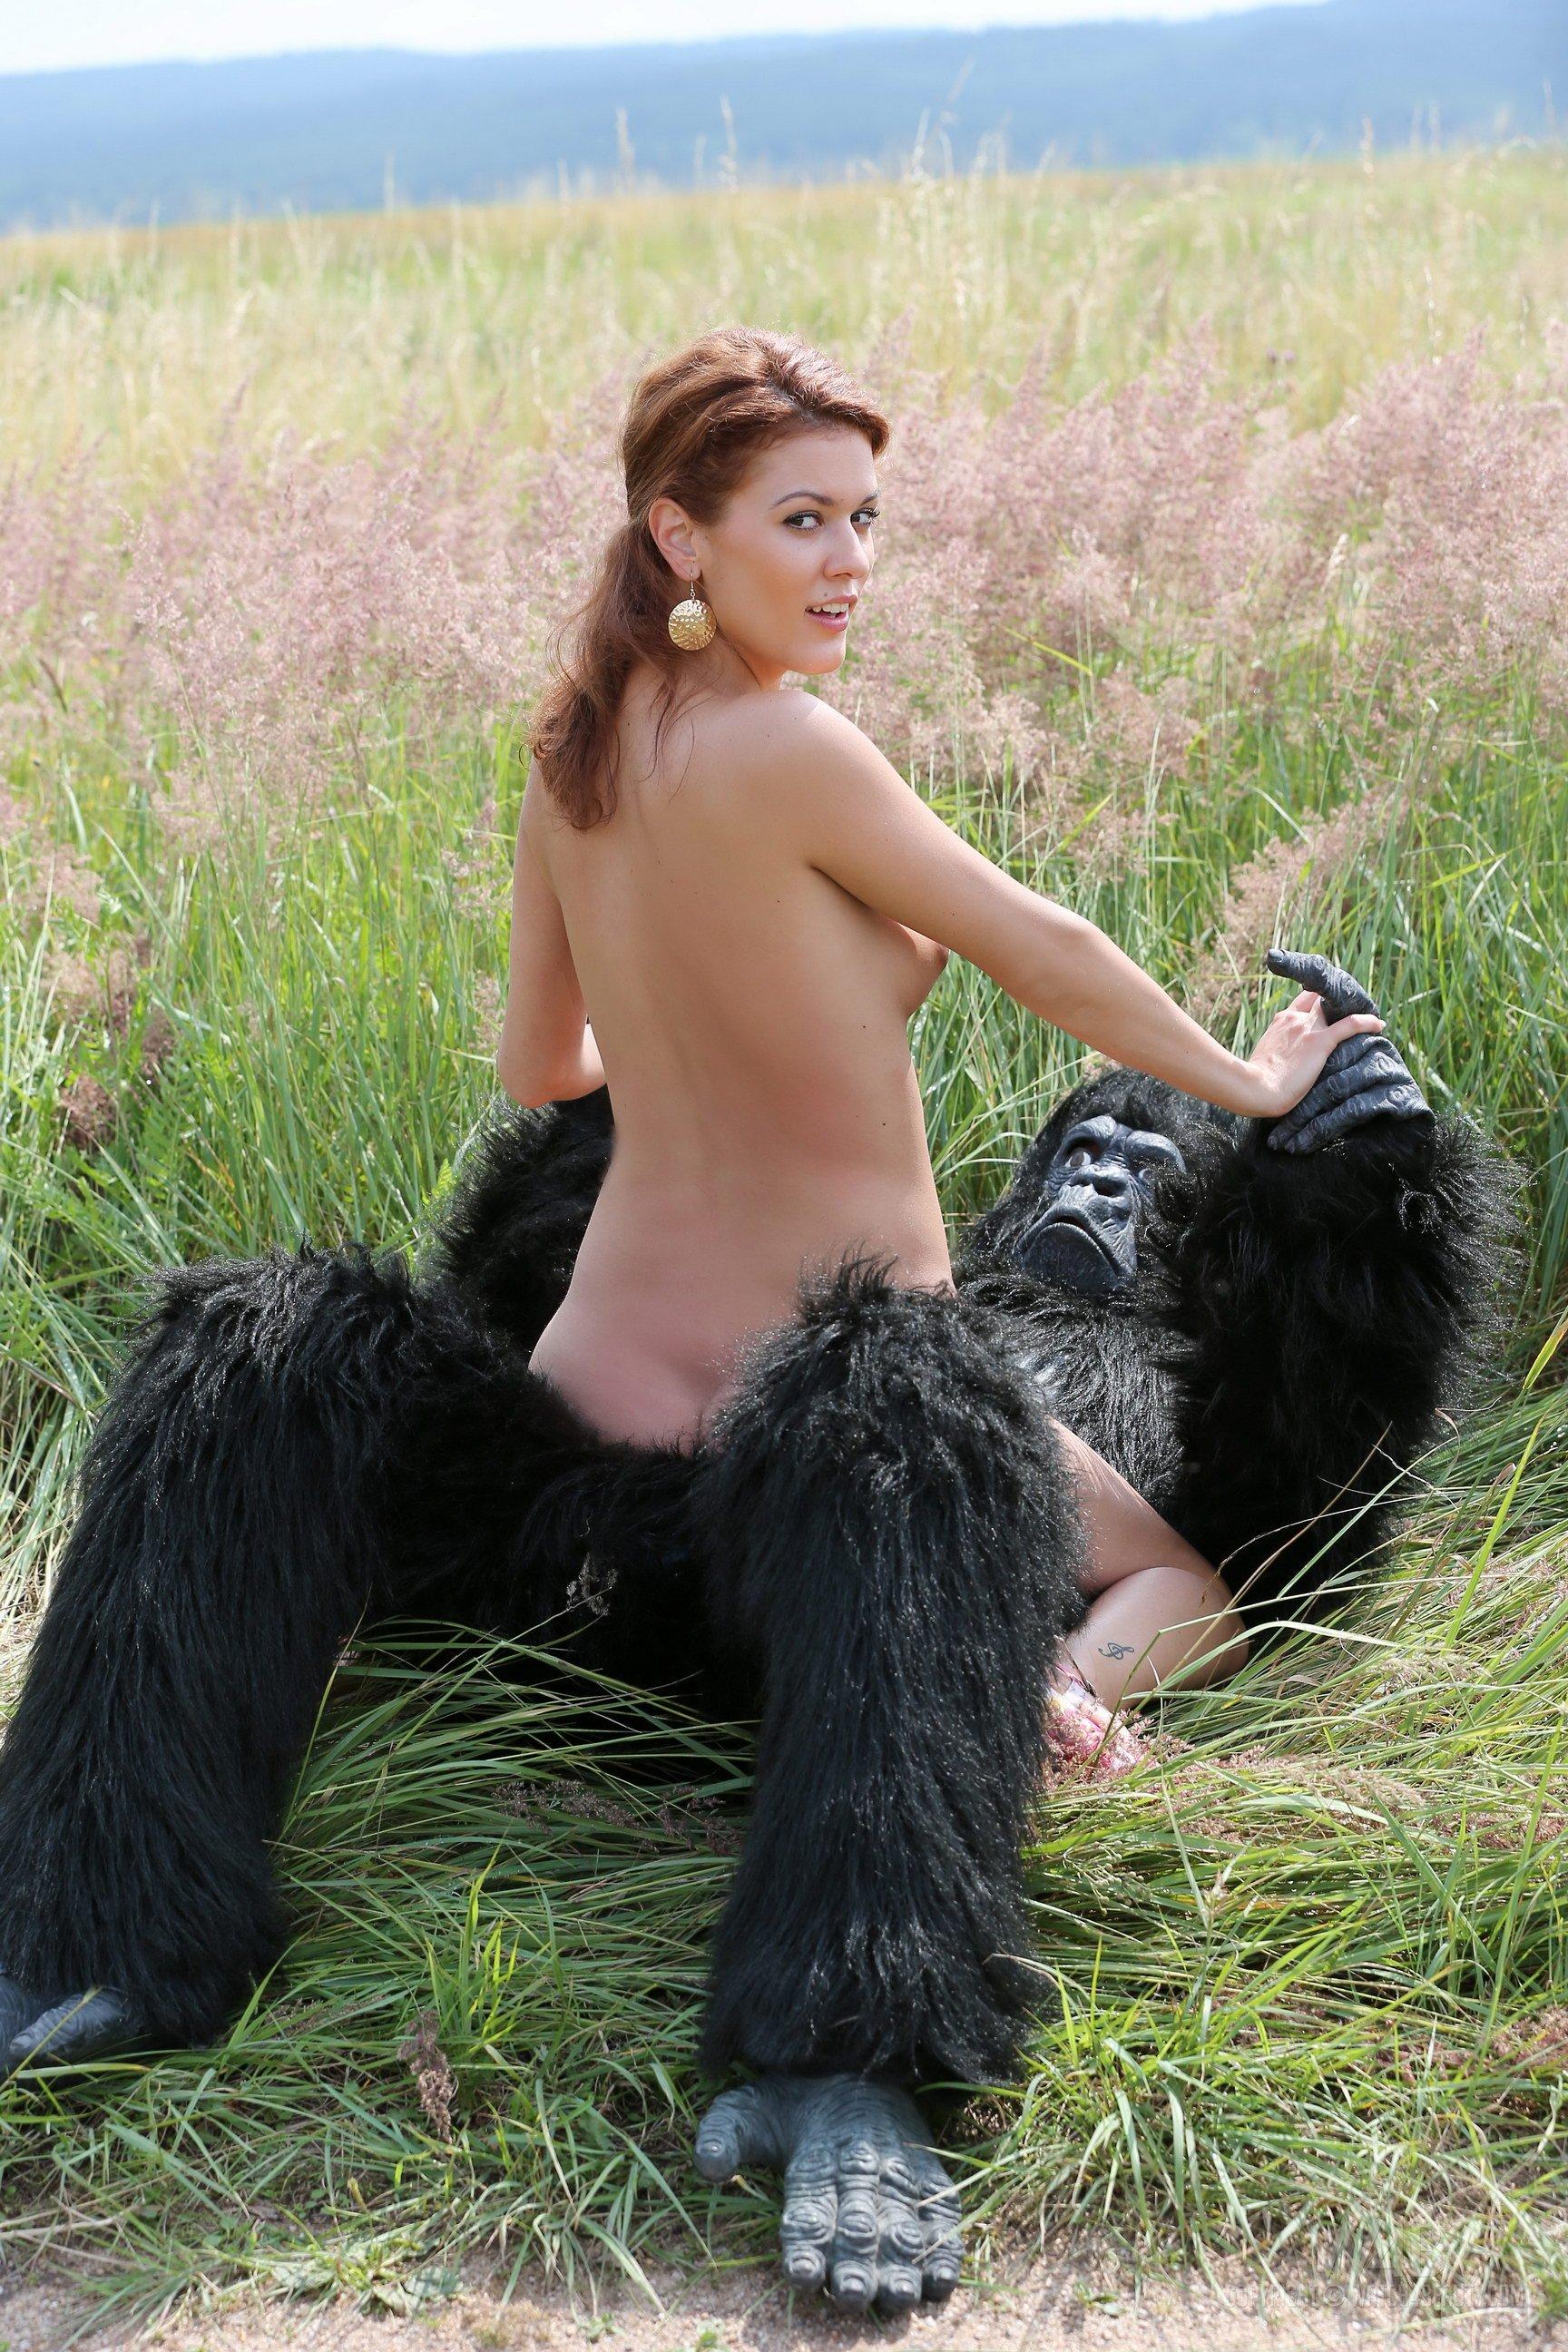 Груповой секс у обезьян смотреть онлайн